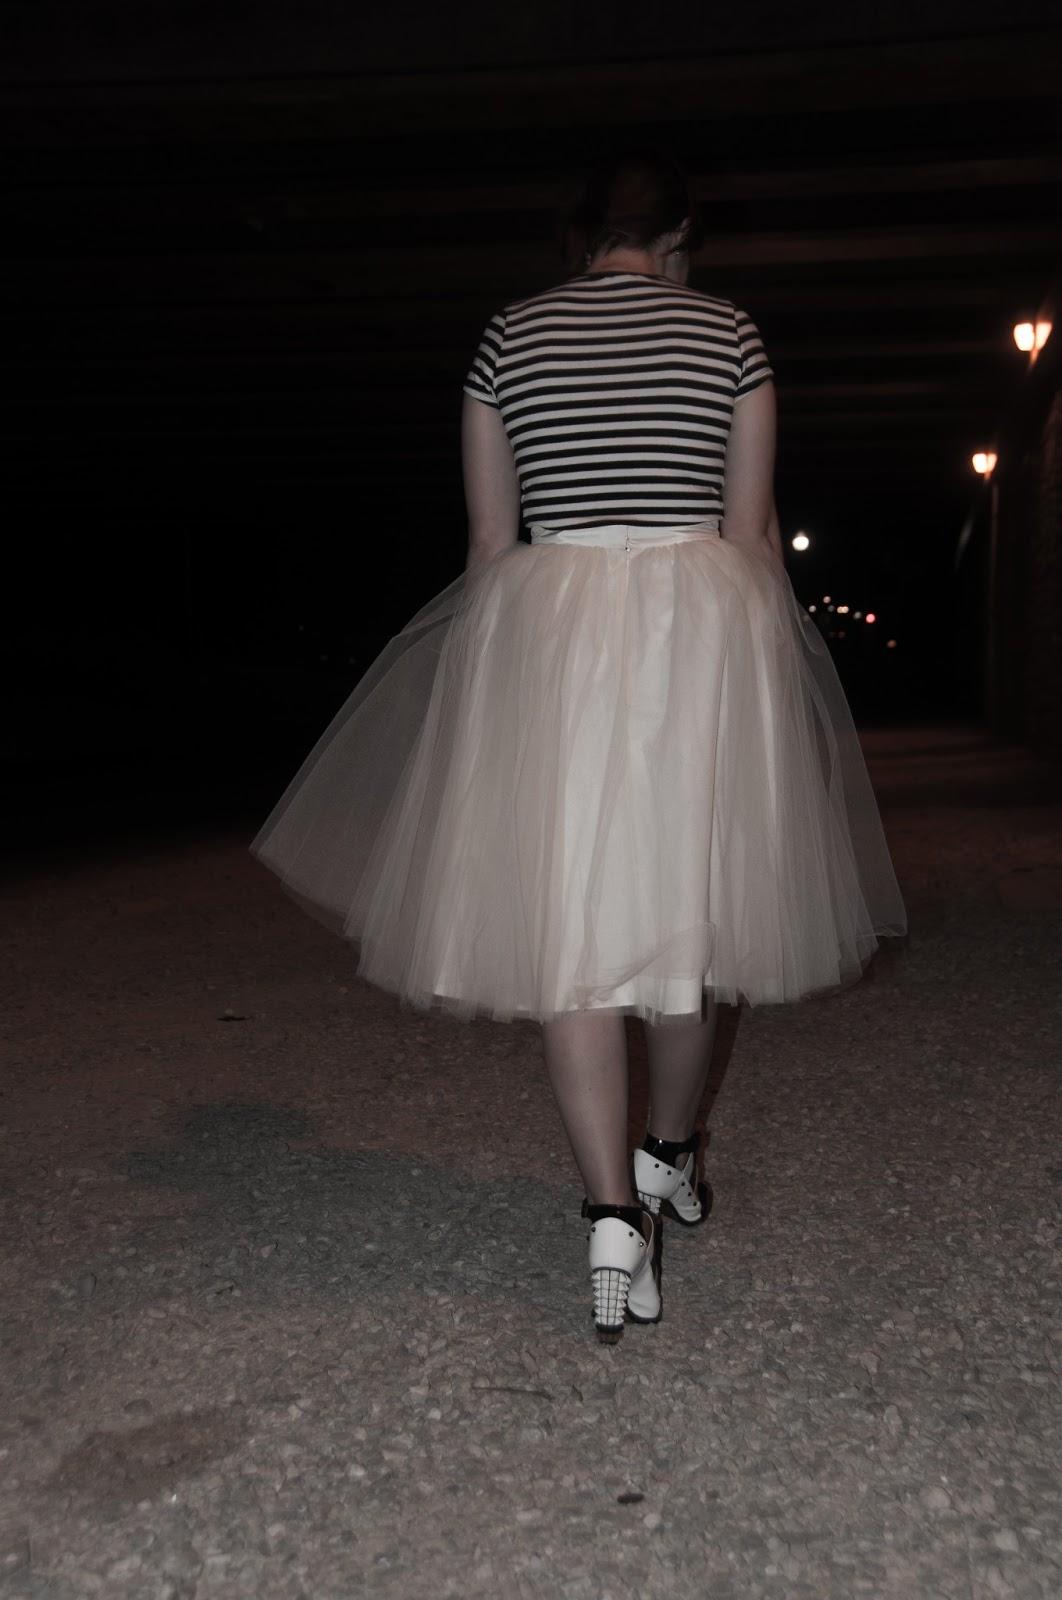 style blog, fashion blog, fashion blogger, womens fashion blog, ootd, anthropologie ootd, anthropologie style blog, forever 21, forever 21 top, alexandra grecco, alexandra grecco the gretta tulle skirt, tulle skirt, betsey johnson, cuff watch, betsey johnson accessories,  fendi, fendi runway, fendi shoes, fendi 2013 runway, fendi 2013 spring runway shoe, fendi open toe shoe boot, fendi spike bootie, fendi bootie, night photo shoot, night shoot, the gretta, new york designer clothing, designer clothing,